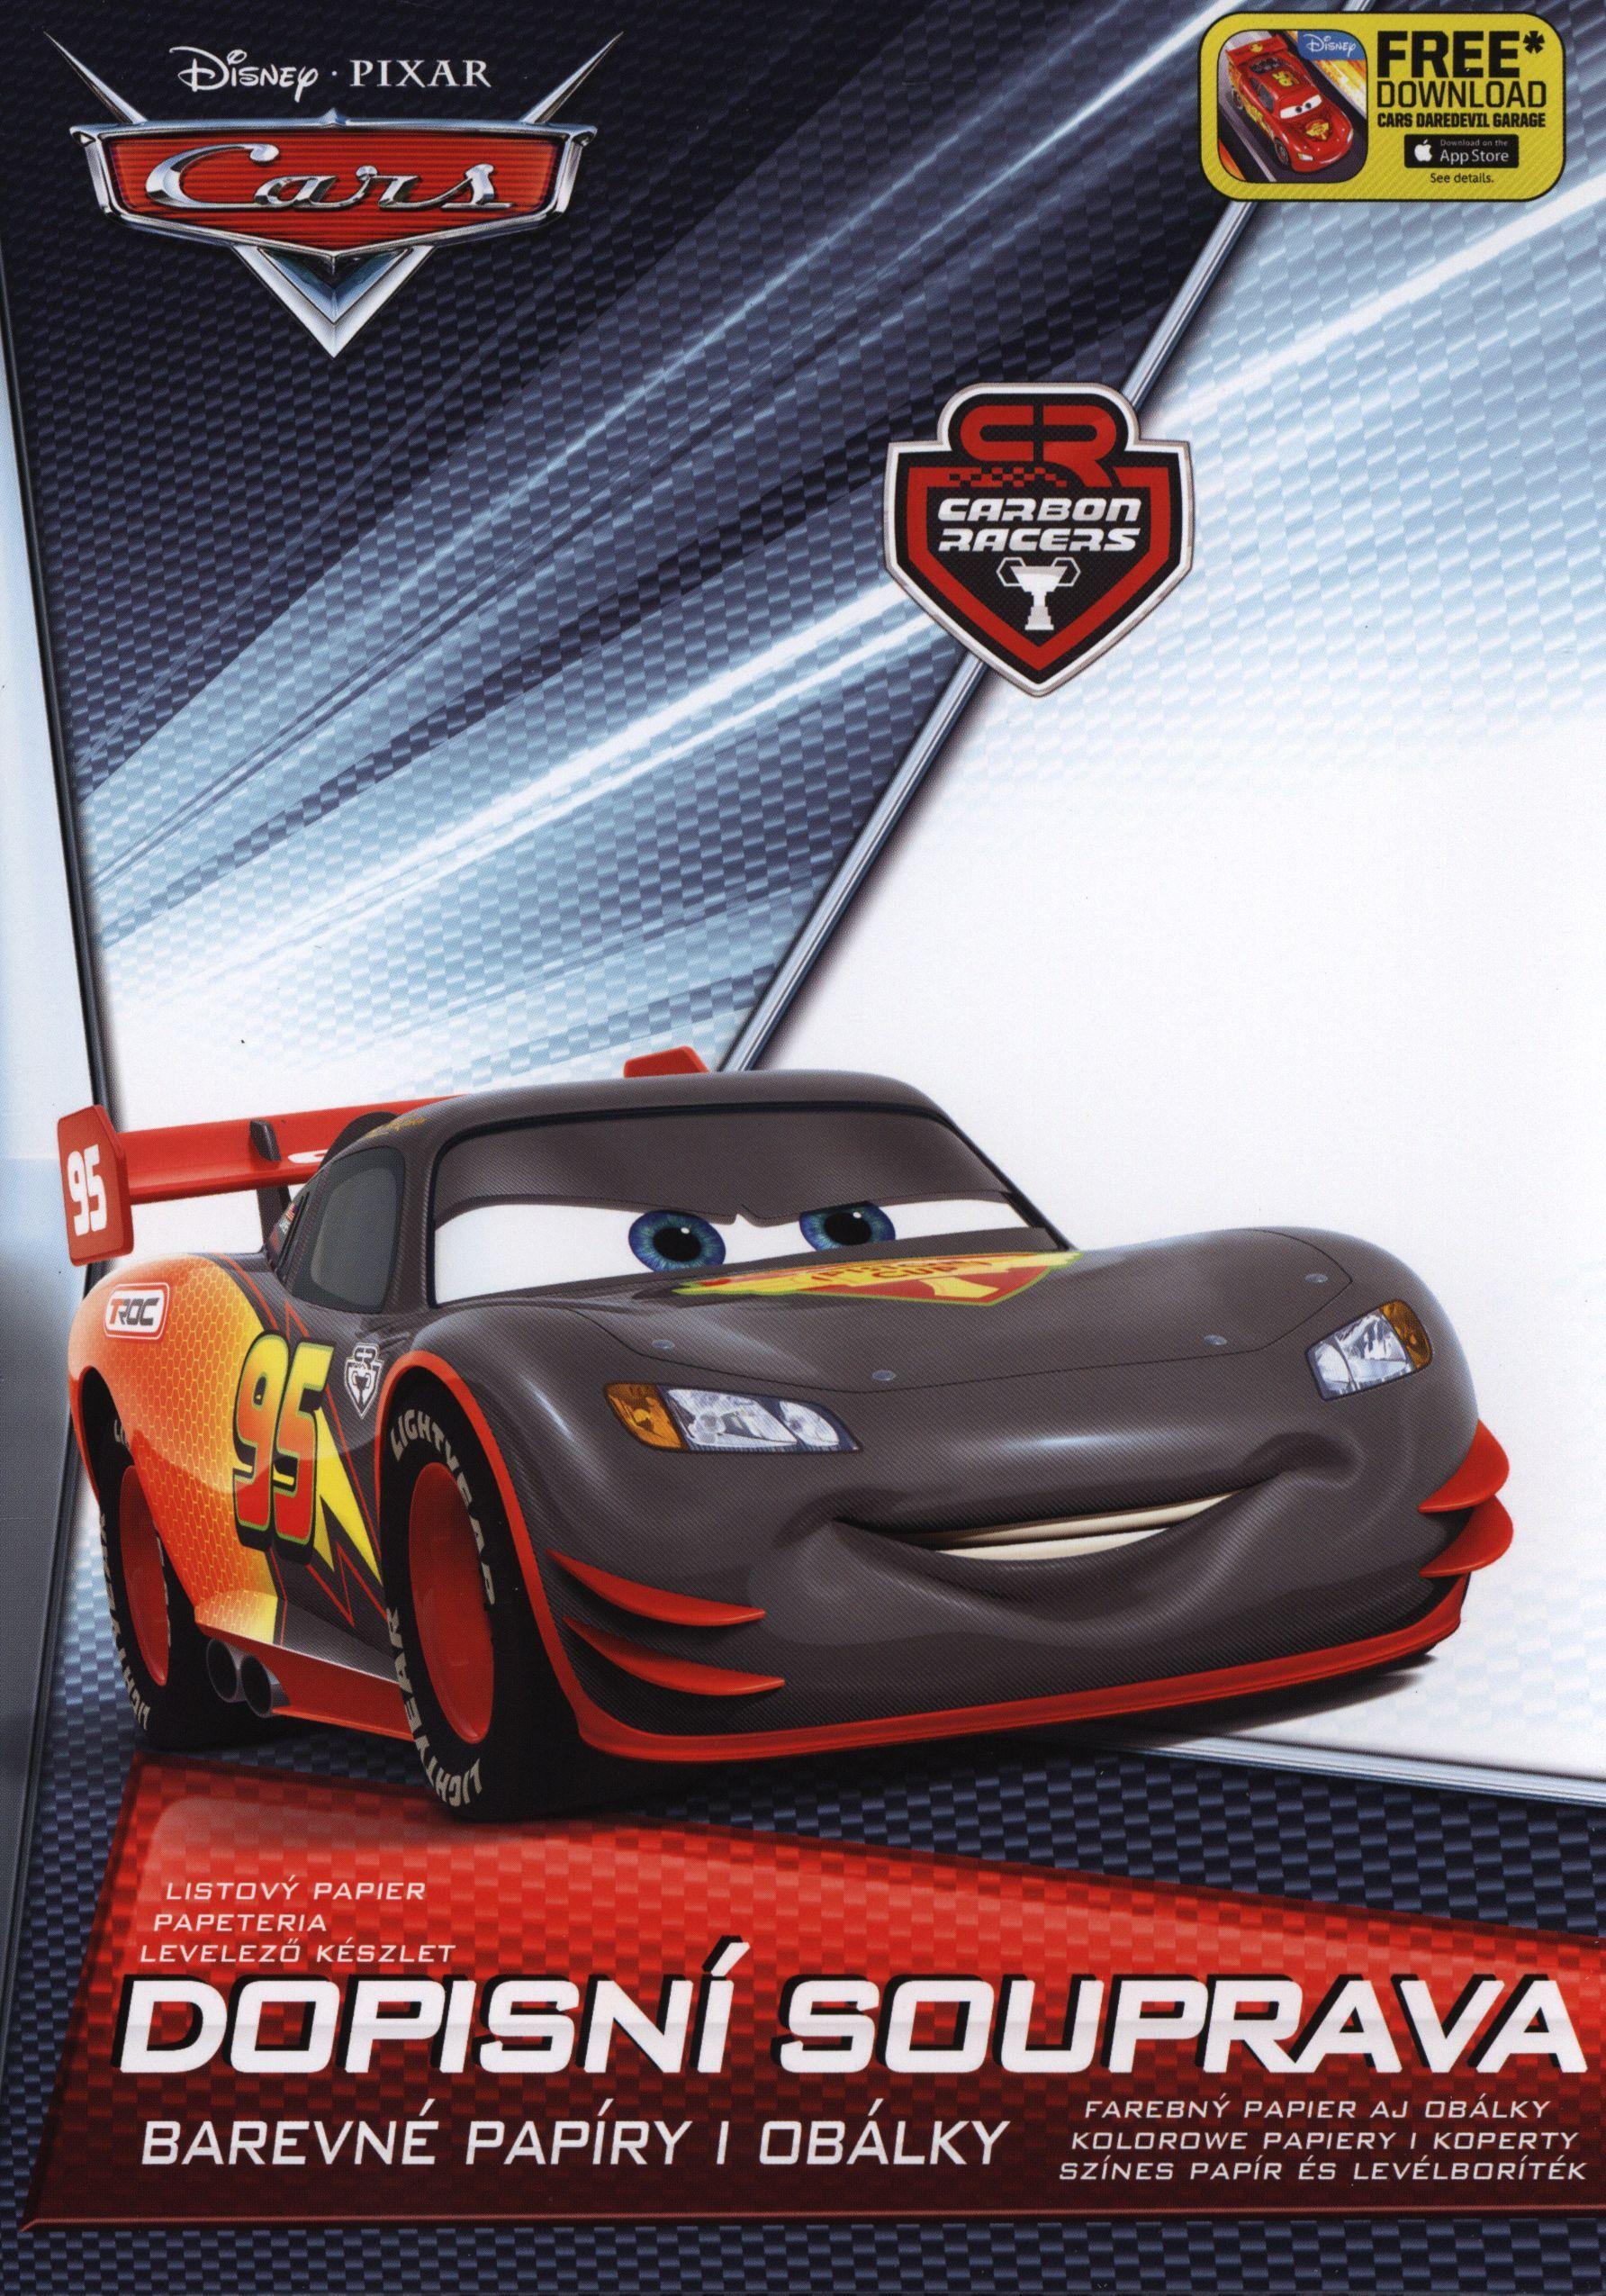 Papeteria Lux 5+10 Disney Cars 2